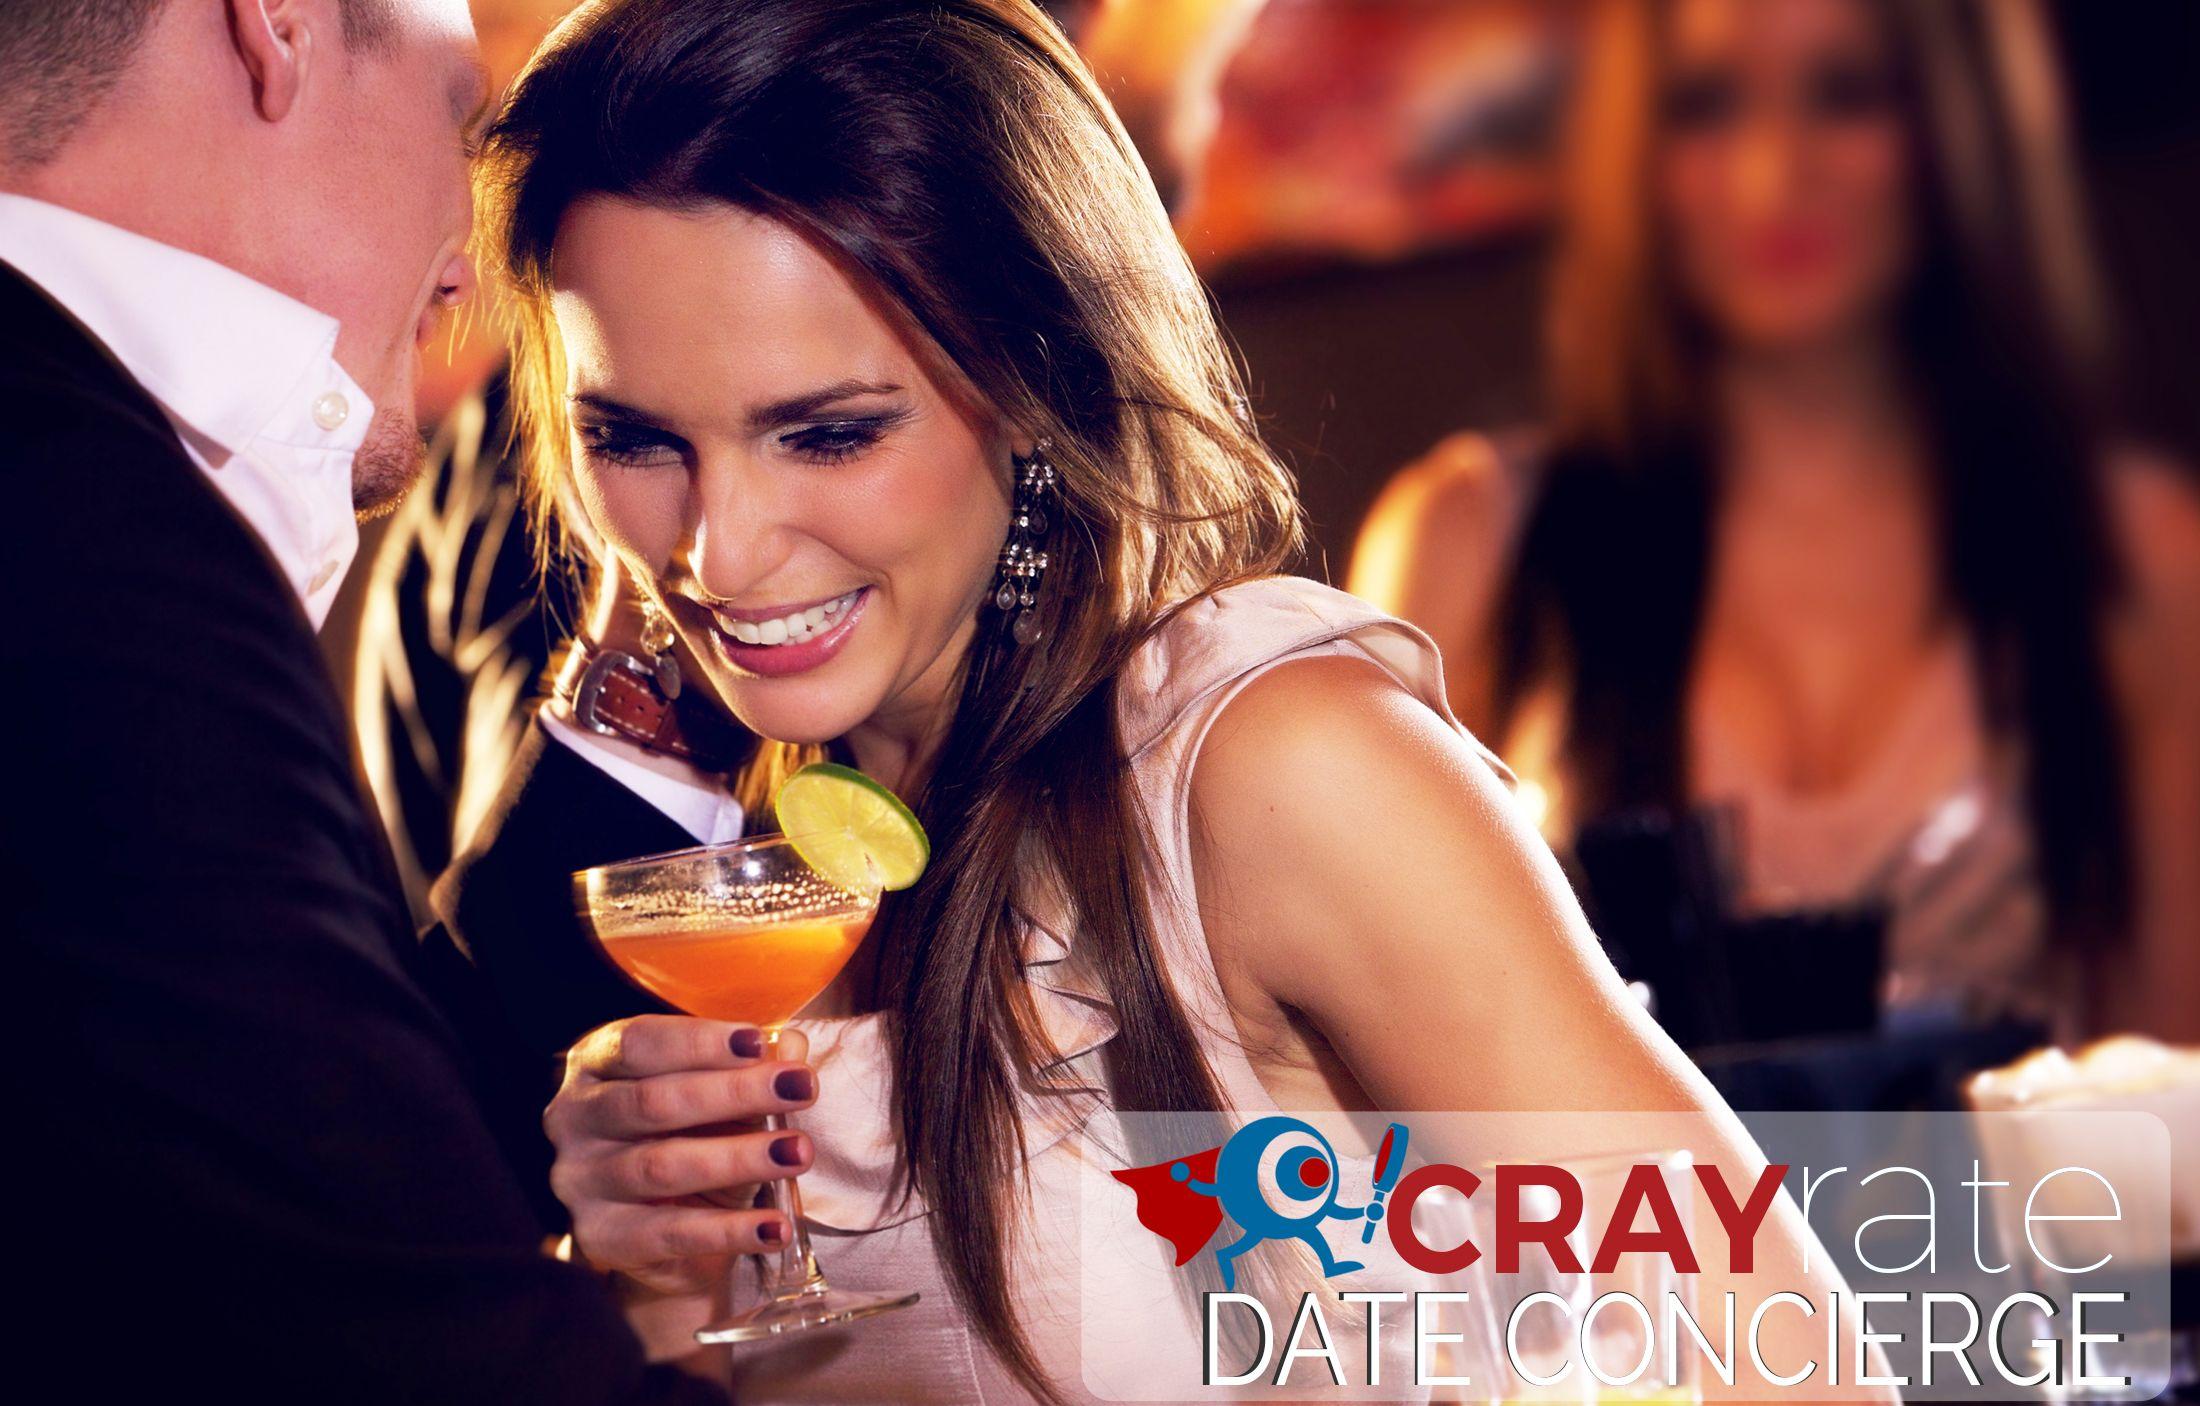 CrayRate -DATE CONCIERGE